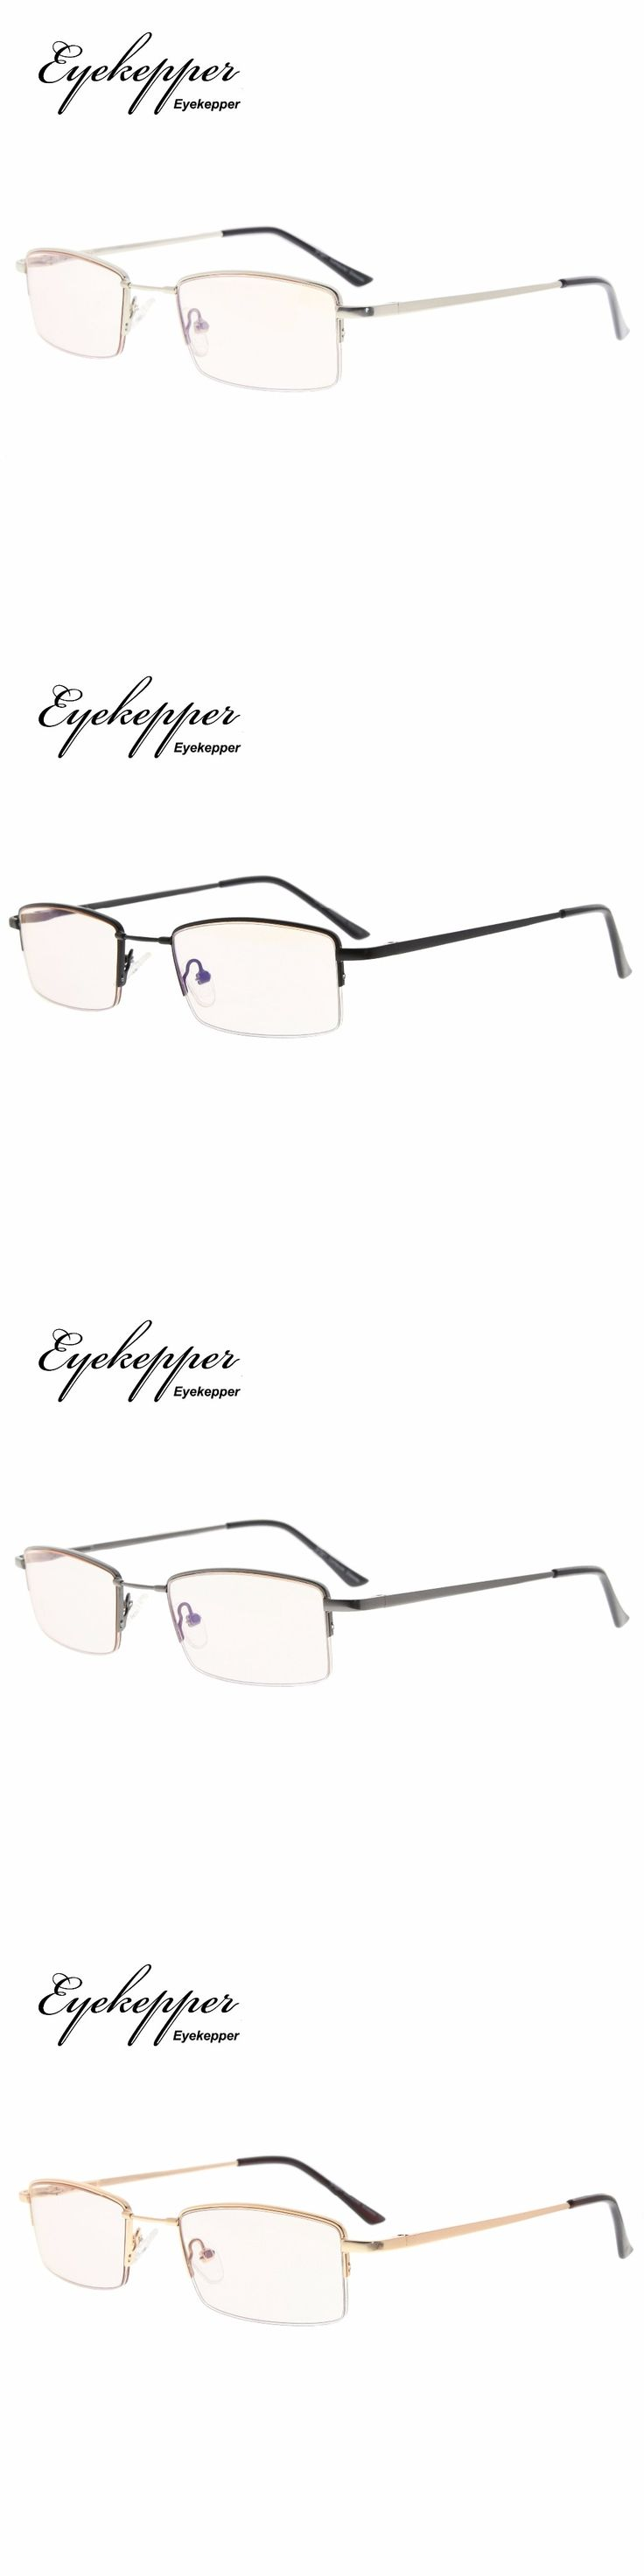 CG1708 Eyekepper Half-rim Memory Titanium Bridge Reading Glasses For Video Games Blue Light Blocking Readers +0.00~+3.00